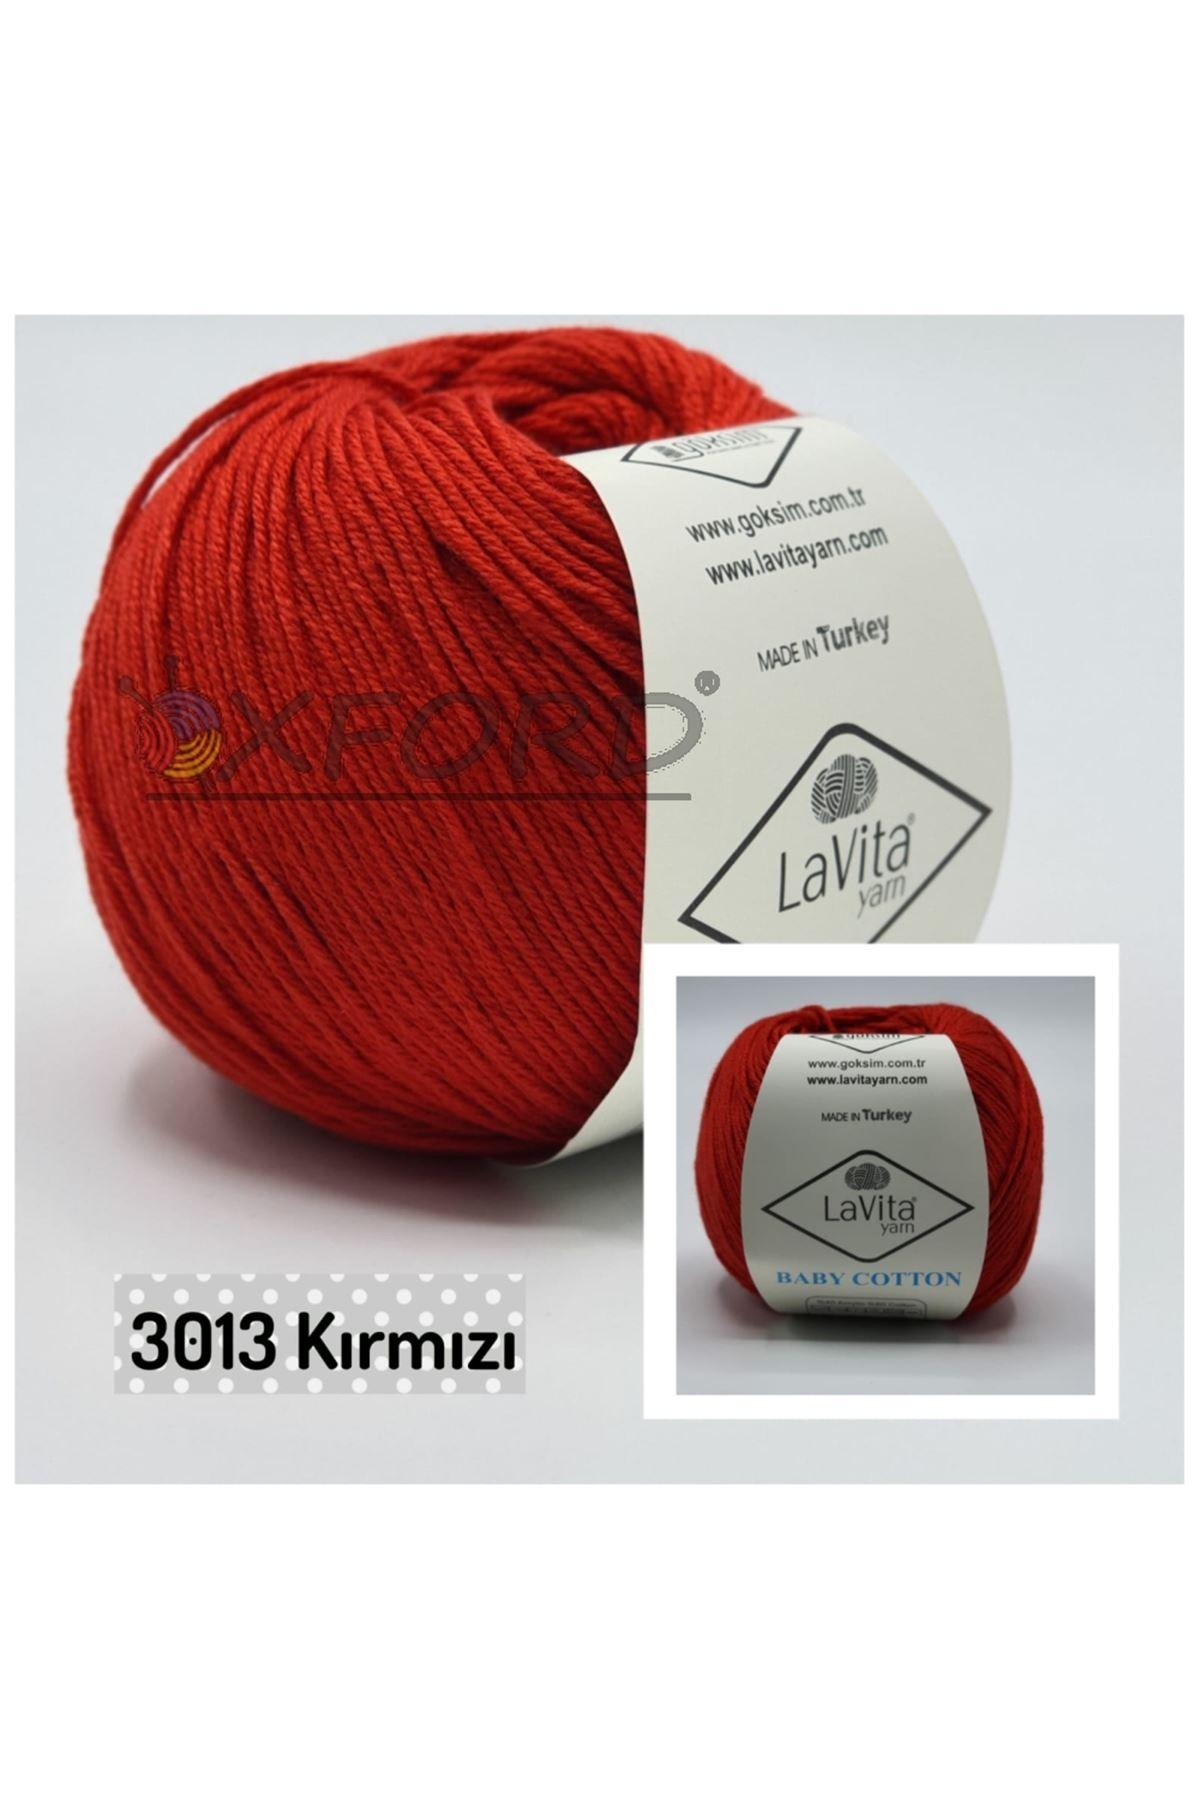 Lavita Baby Cotton 3013 Kırmızı